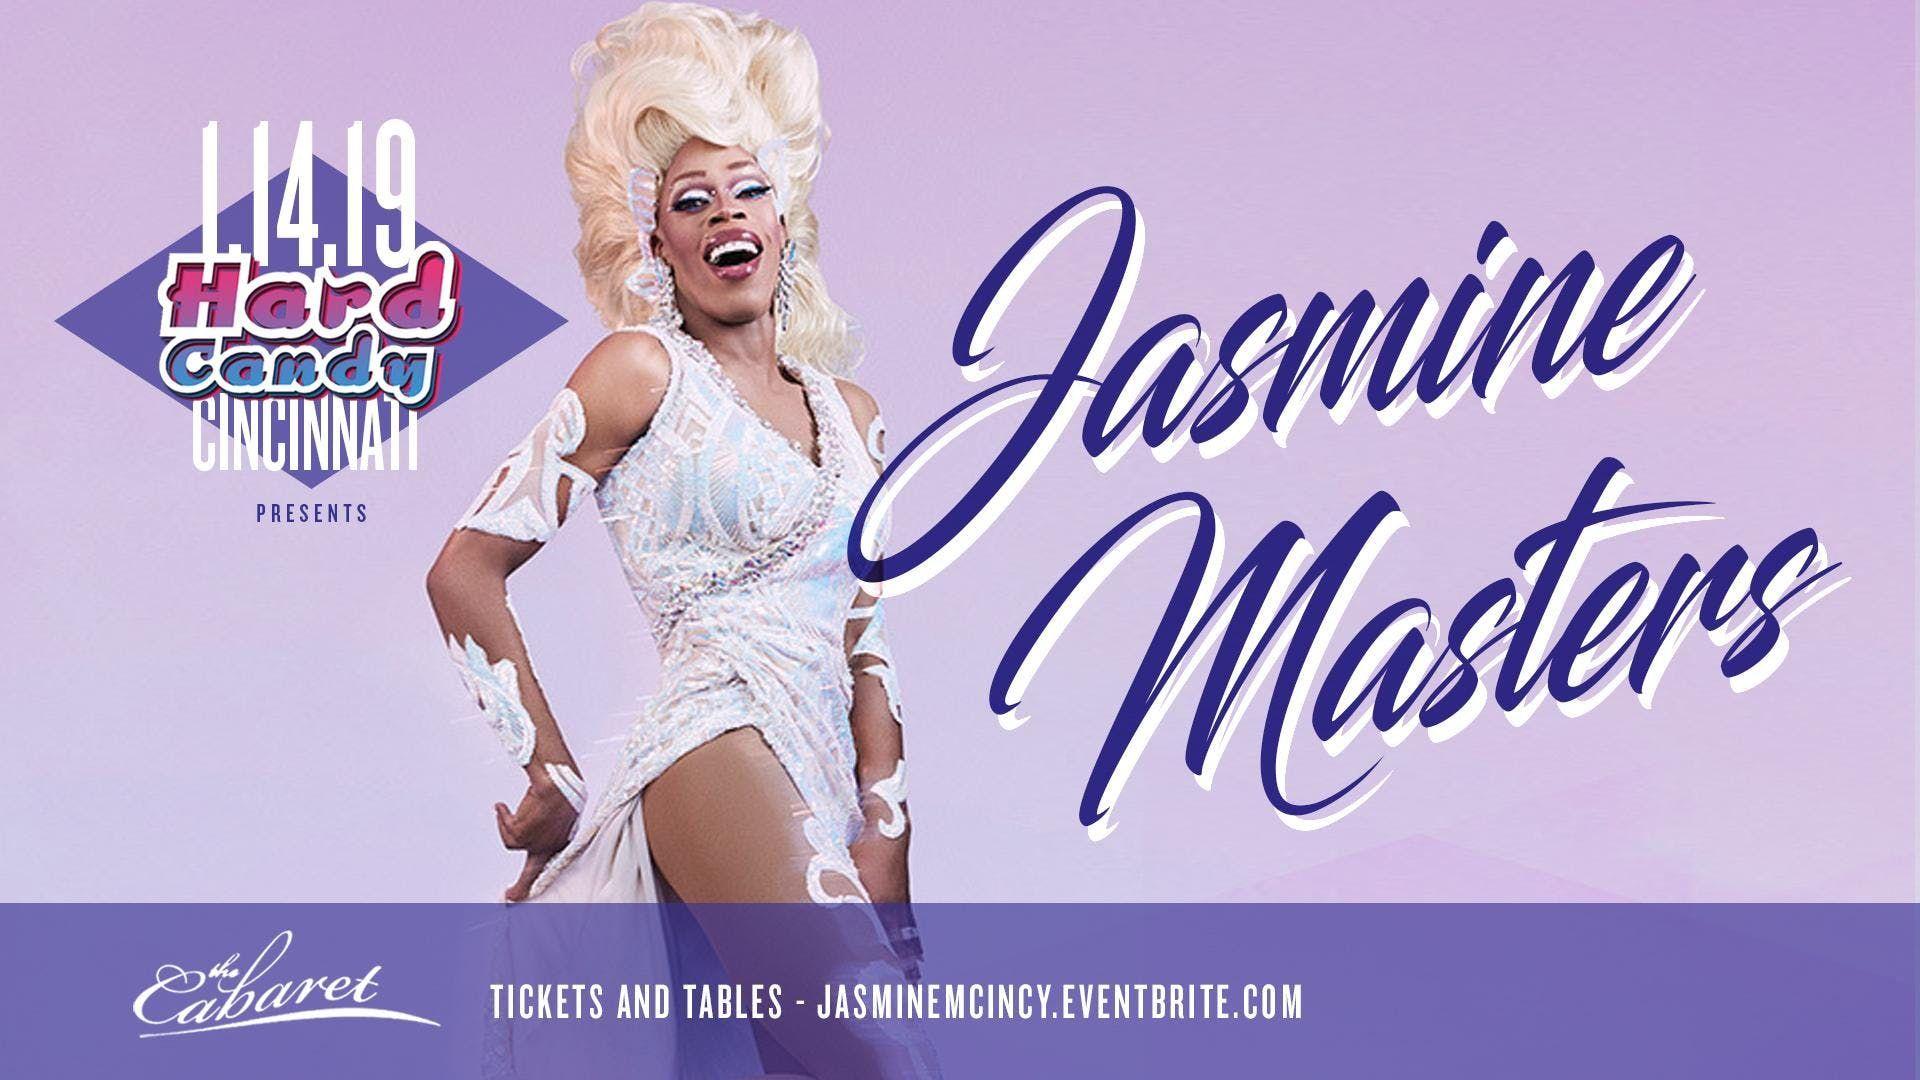 Hard Candy Cincinnati with Jasmine Masters and T Rex